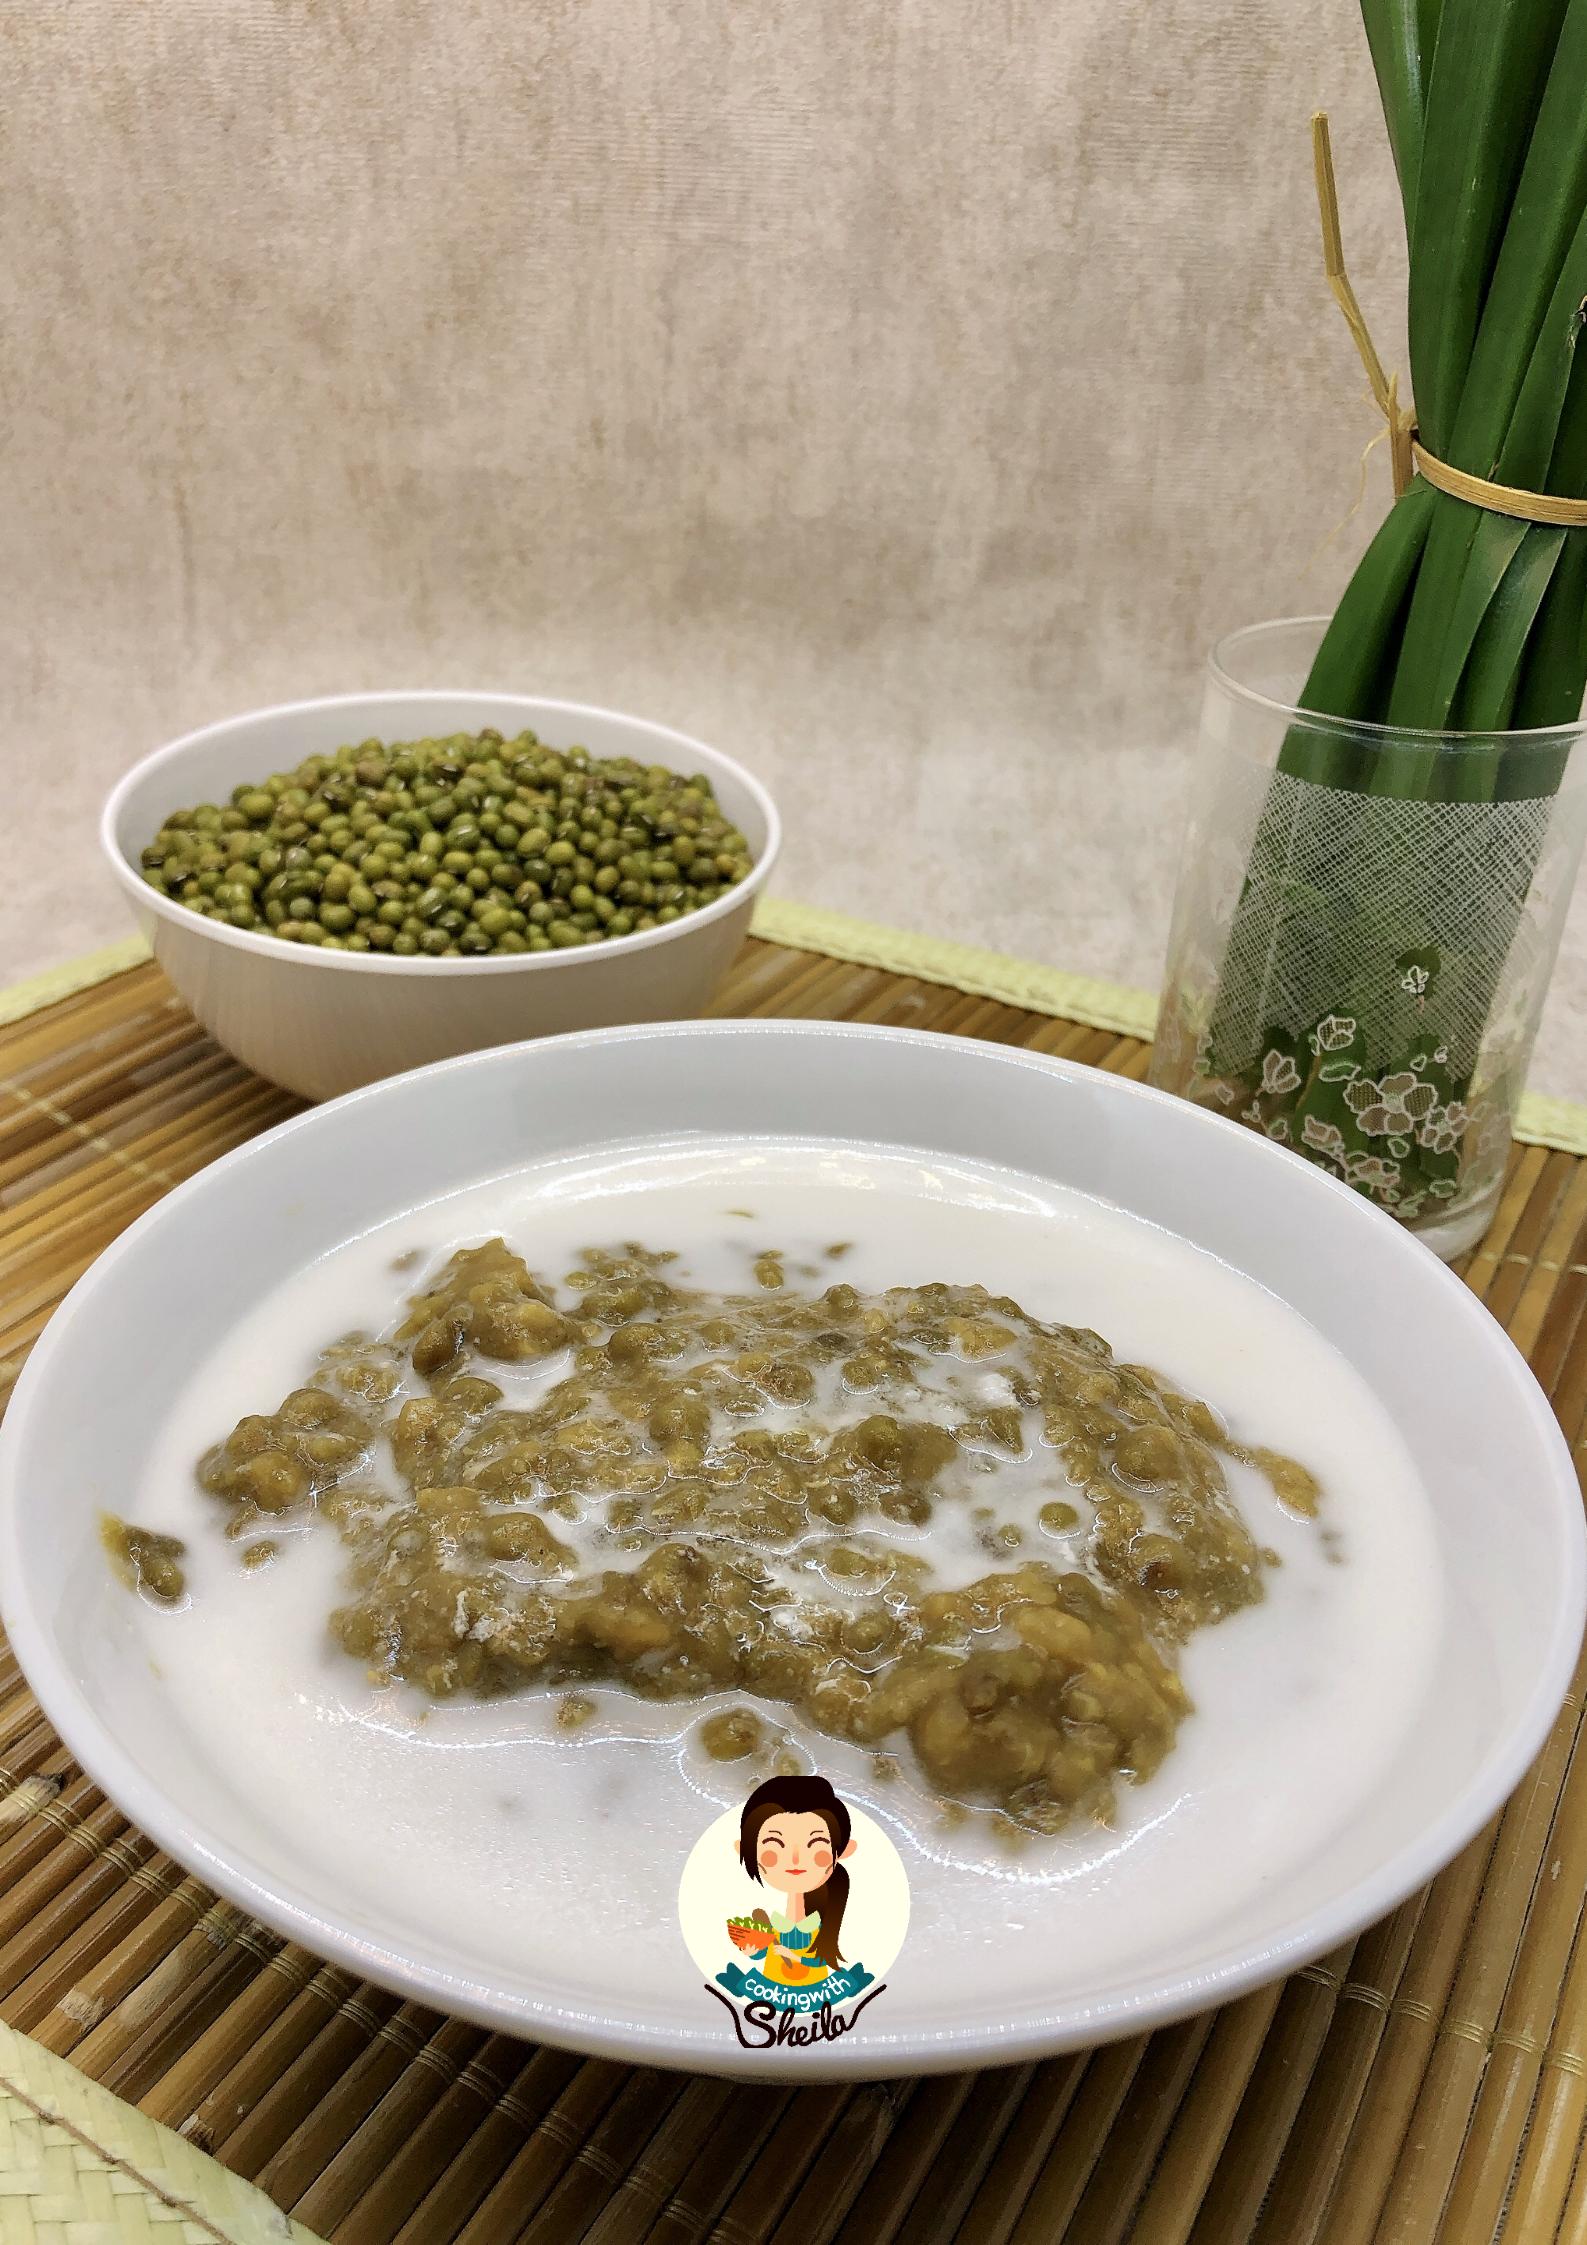 Bubur Kacang Ijo Cooking With Sheila Kacang Memasak Rebusan